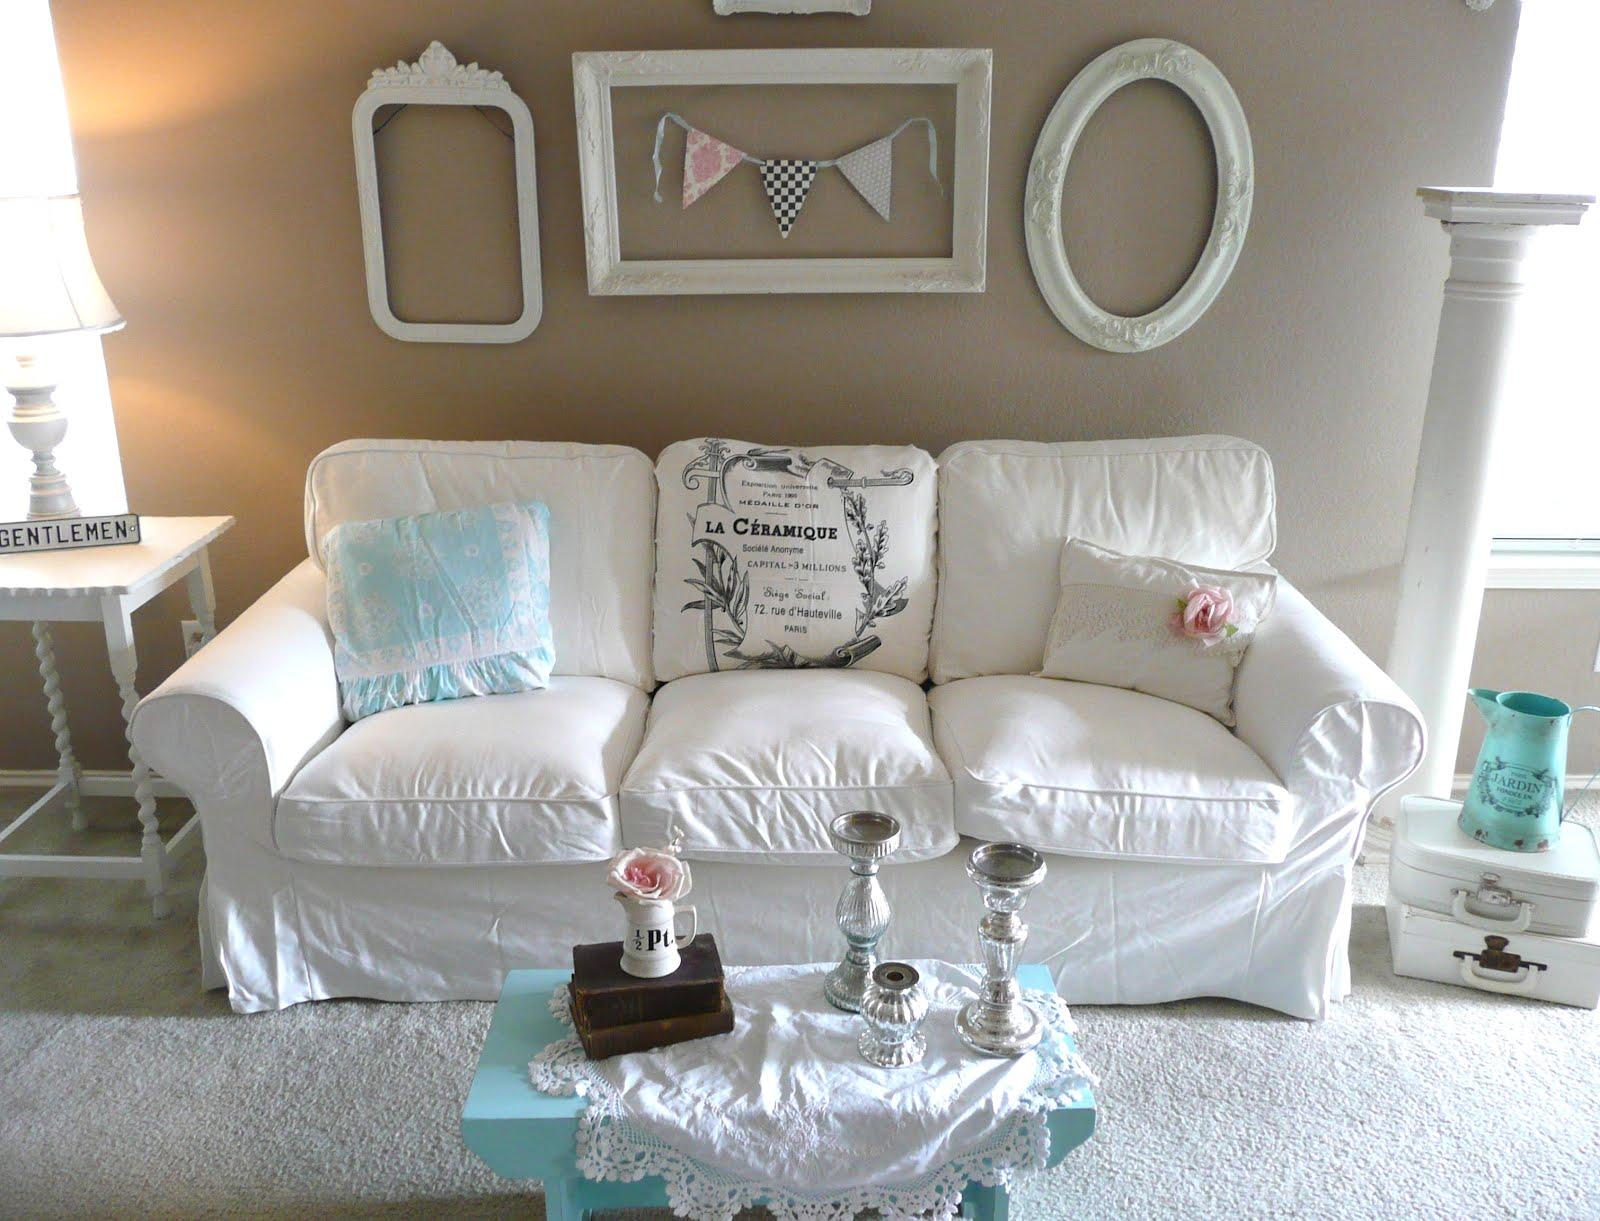 pottery barn basic sofa craigslist mattress topper bed rose garden romantic